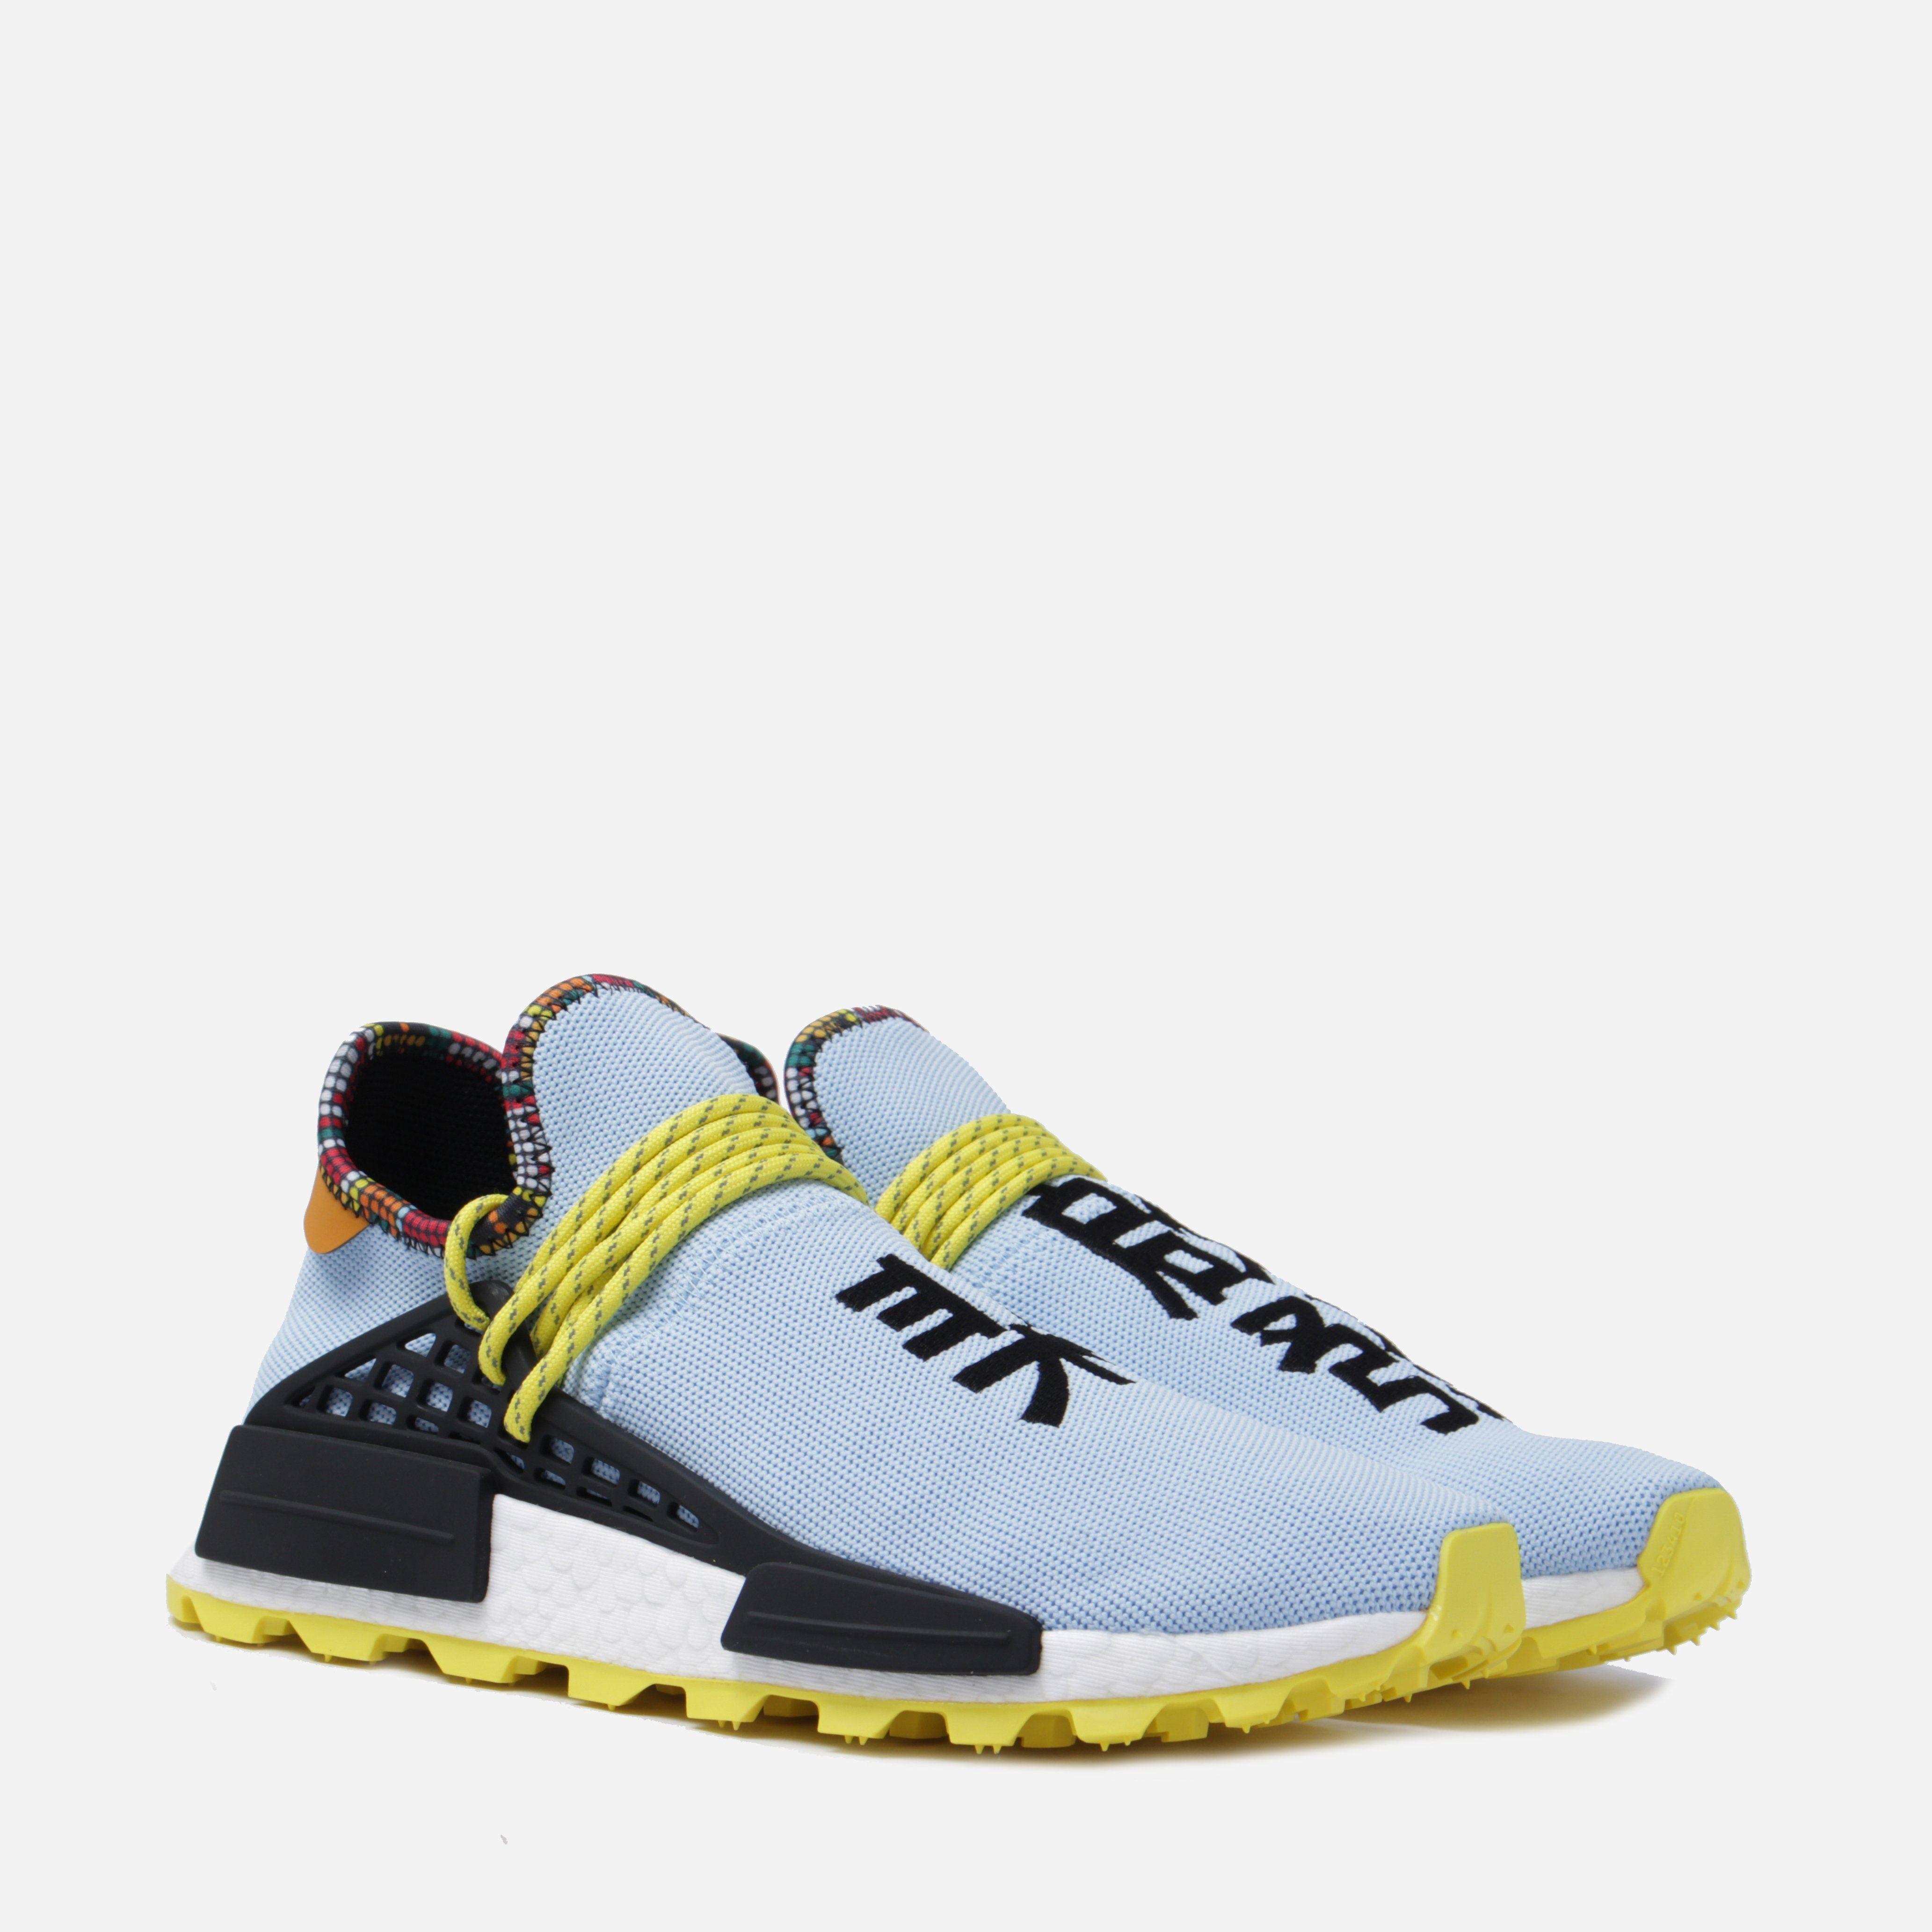 adidas Originals X Pharrell PW HU NMD